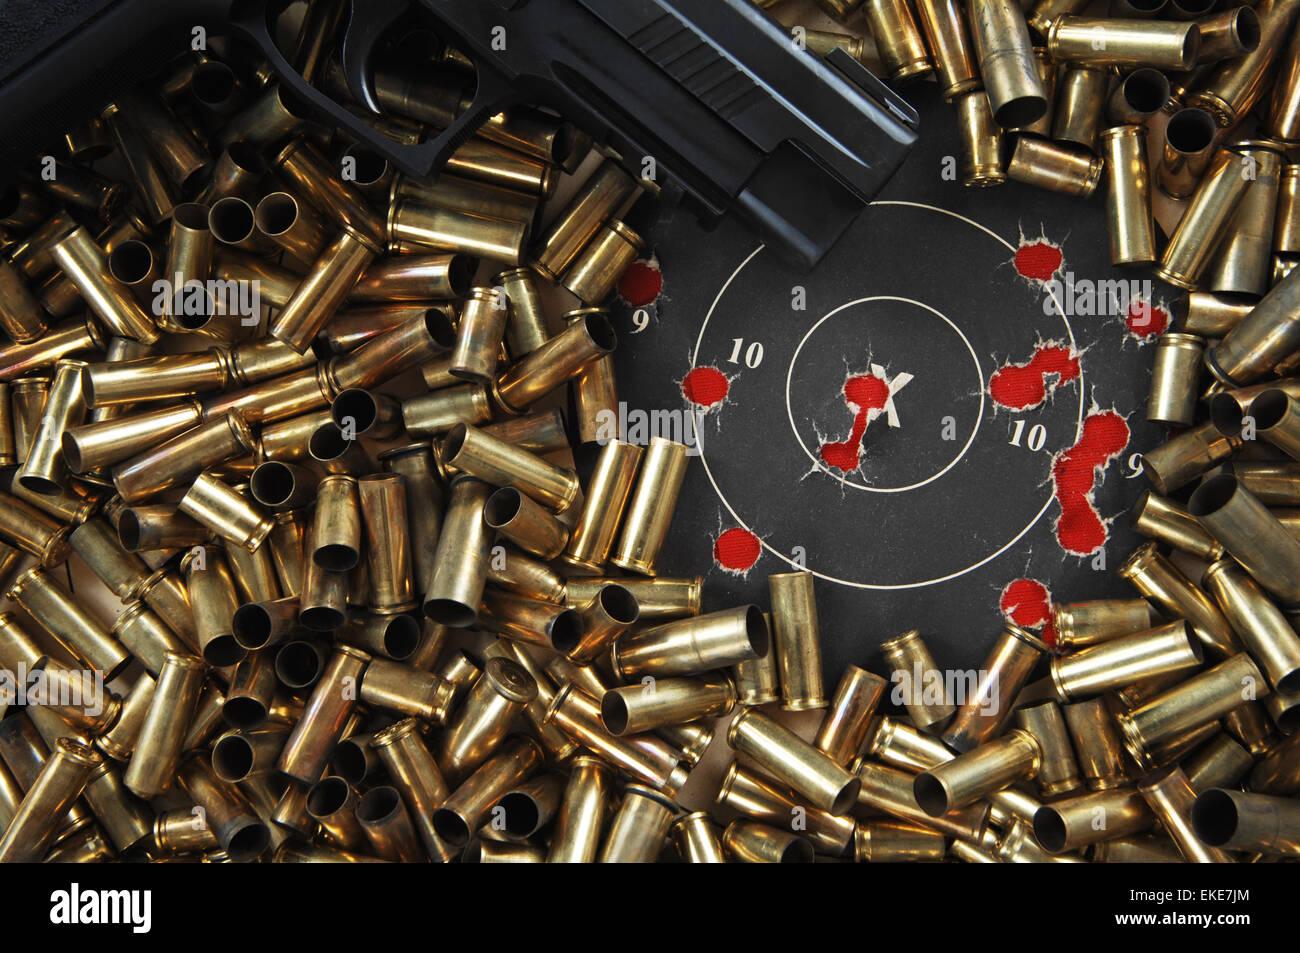 Target Practice, Pistol, Brass and paper target Stock Photo